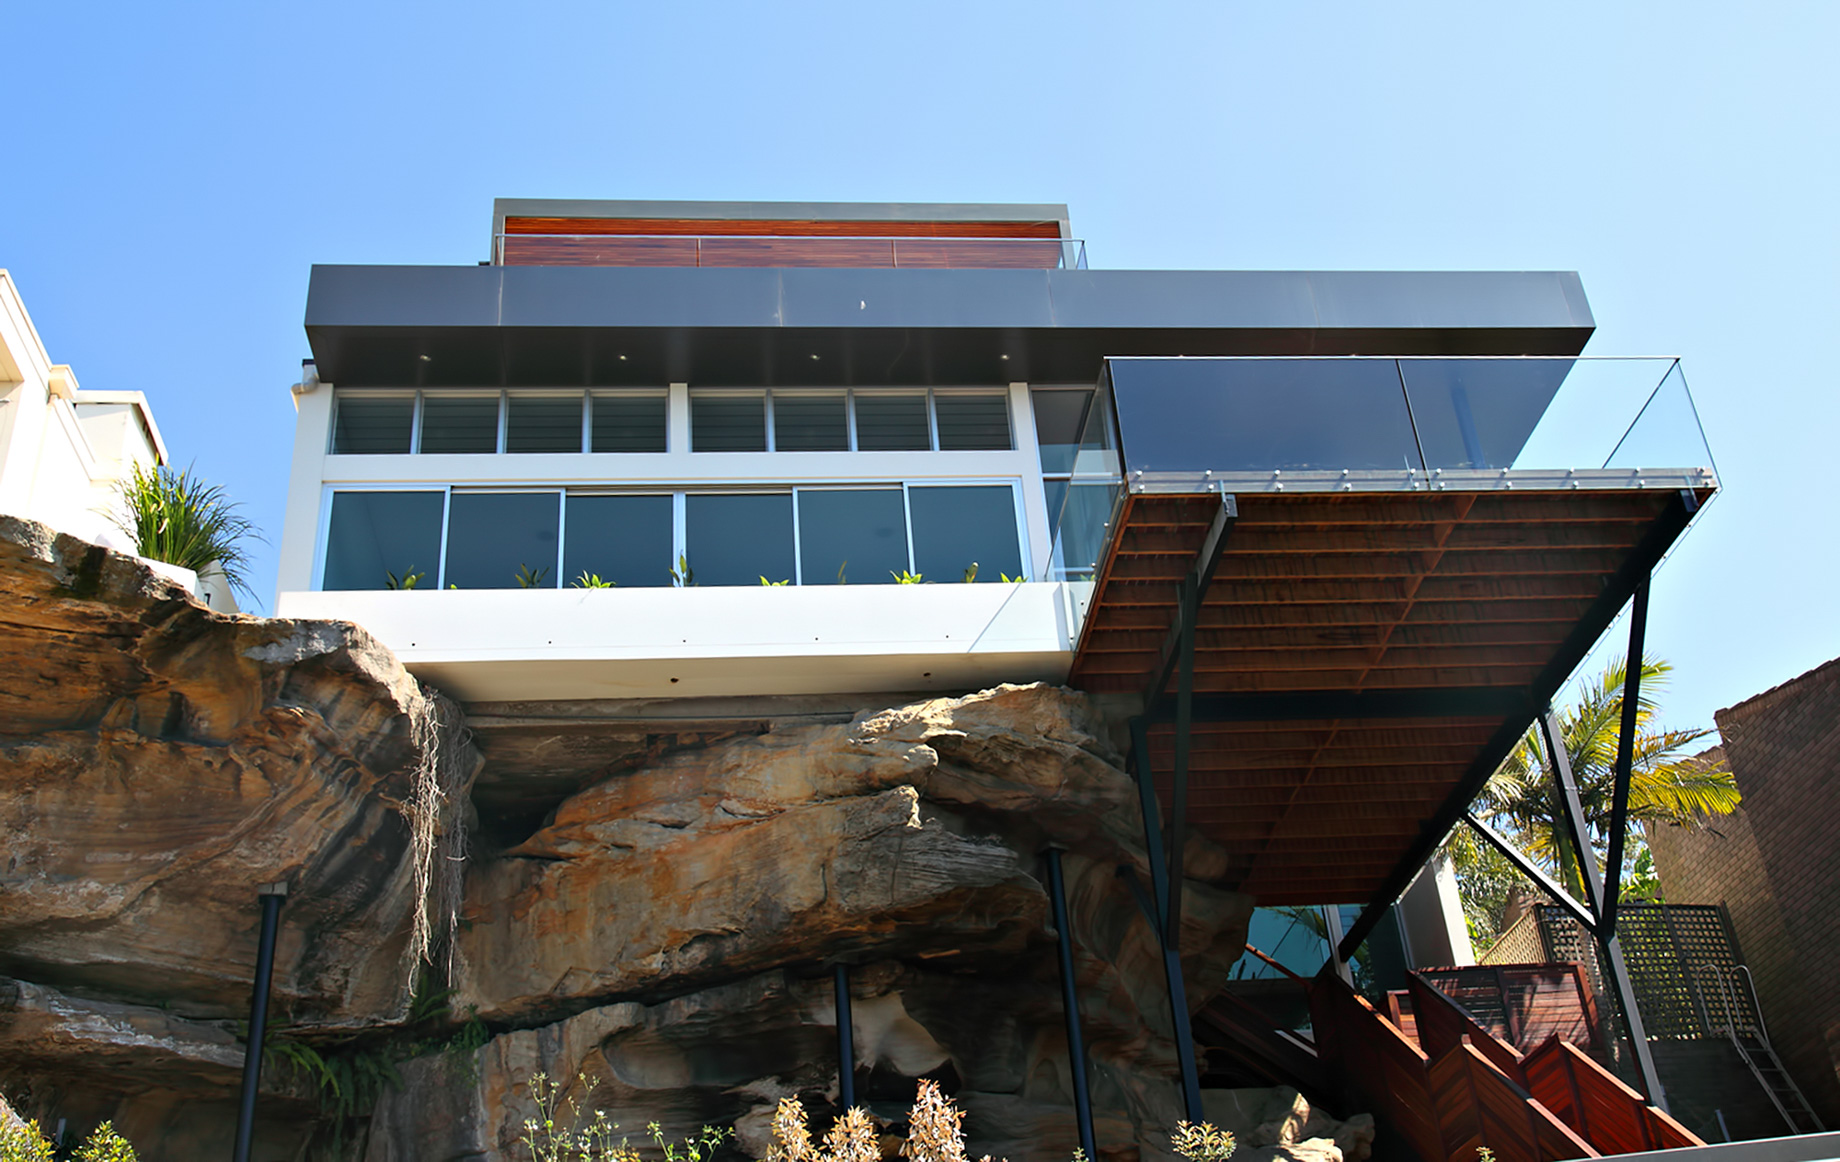 36 Kangaroo Point Road Residence - Kangaroo Point, Sydney, NSW, Australia